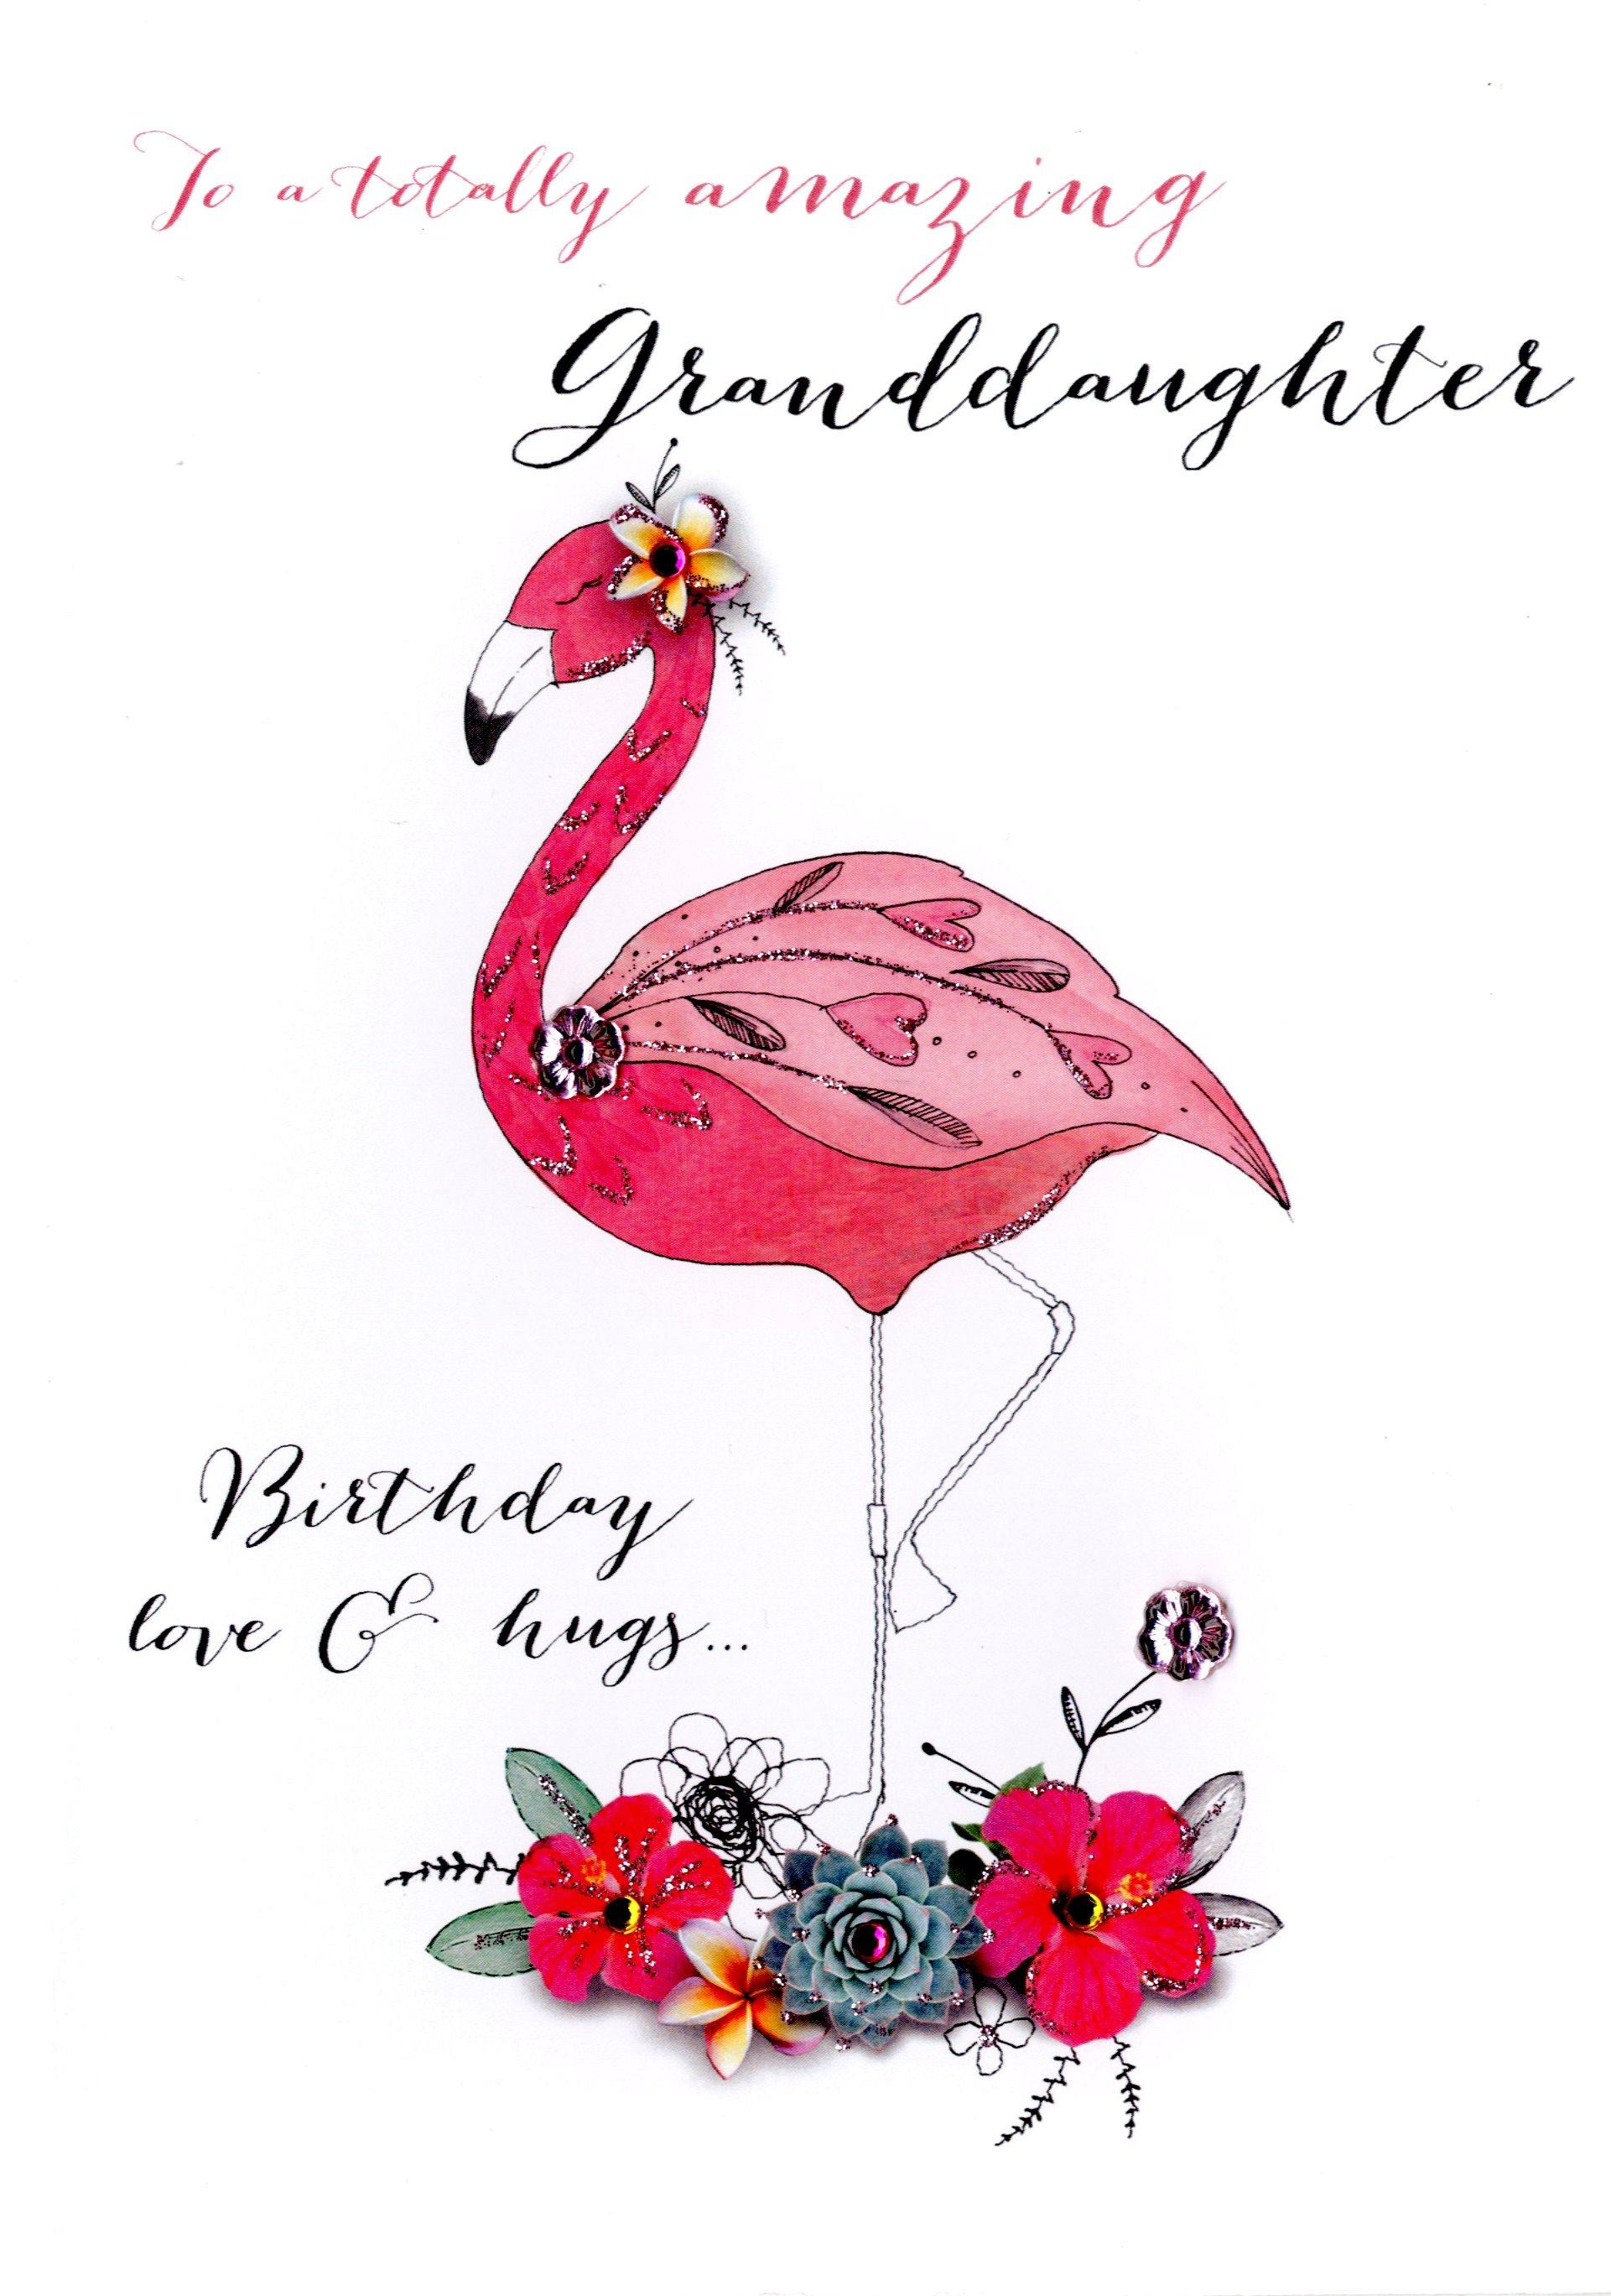 Amazing Granddaughter Birthday Embellished Greeting Card